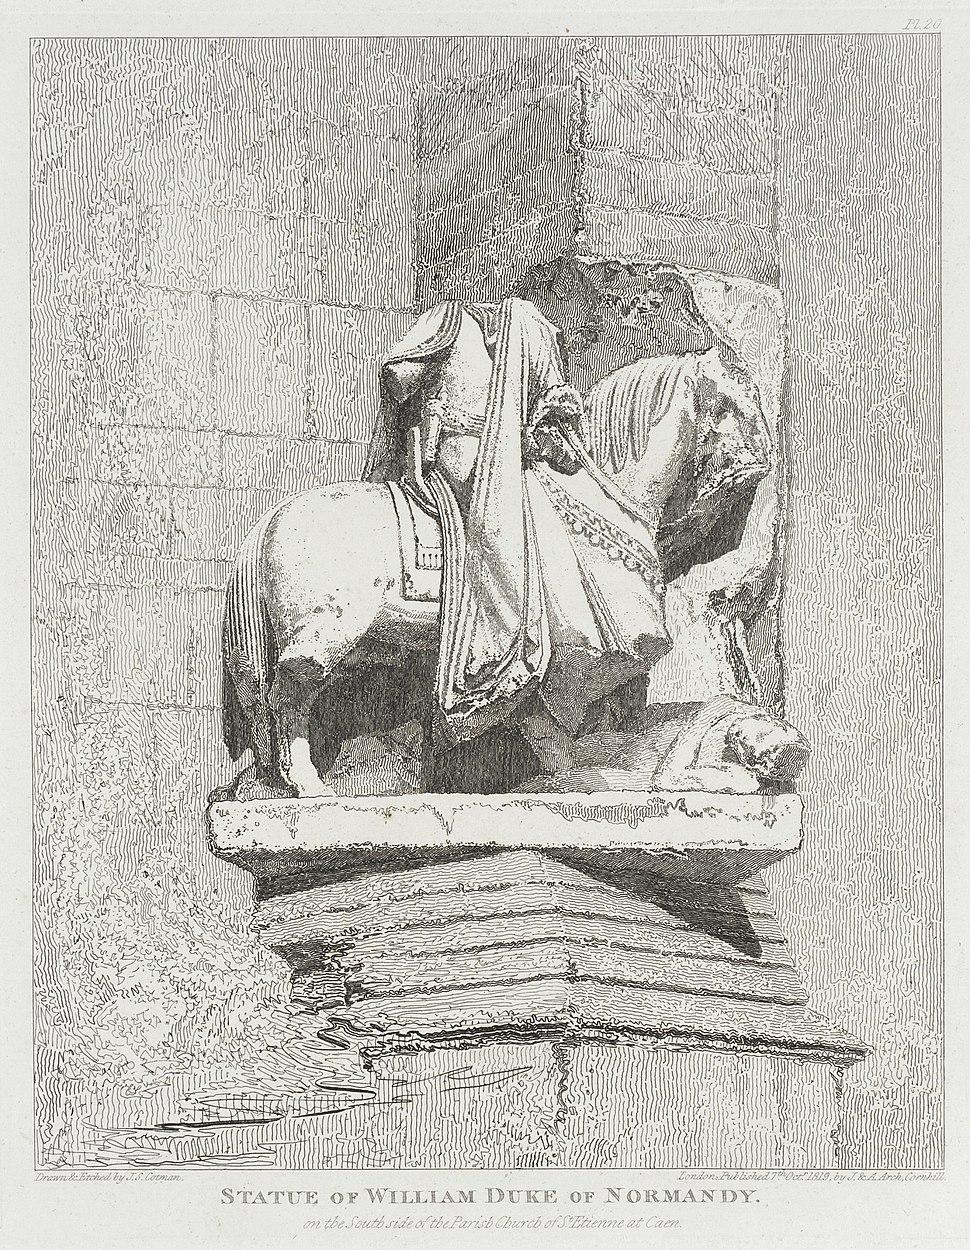 Statue of William, Duke of Normandy LACMA M.88.91.477